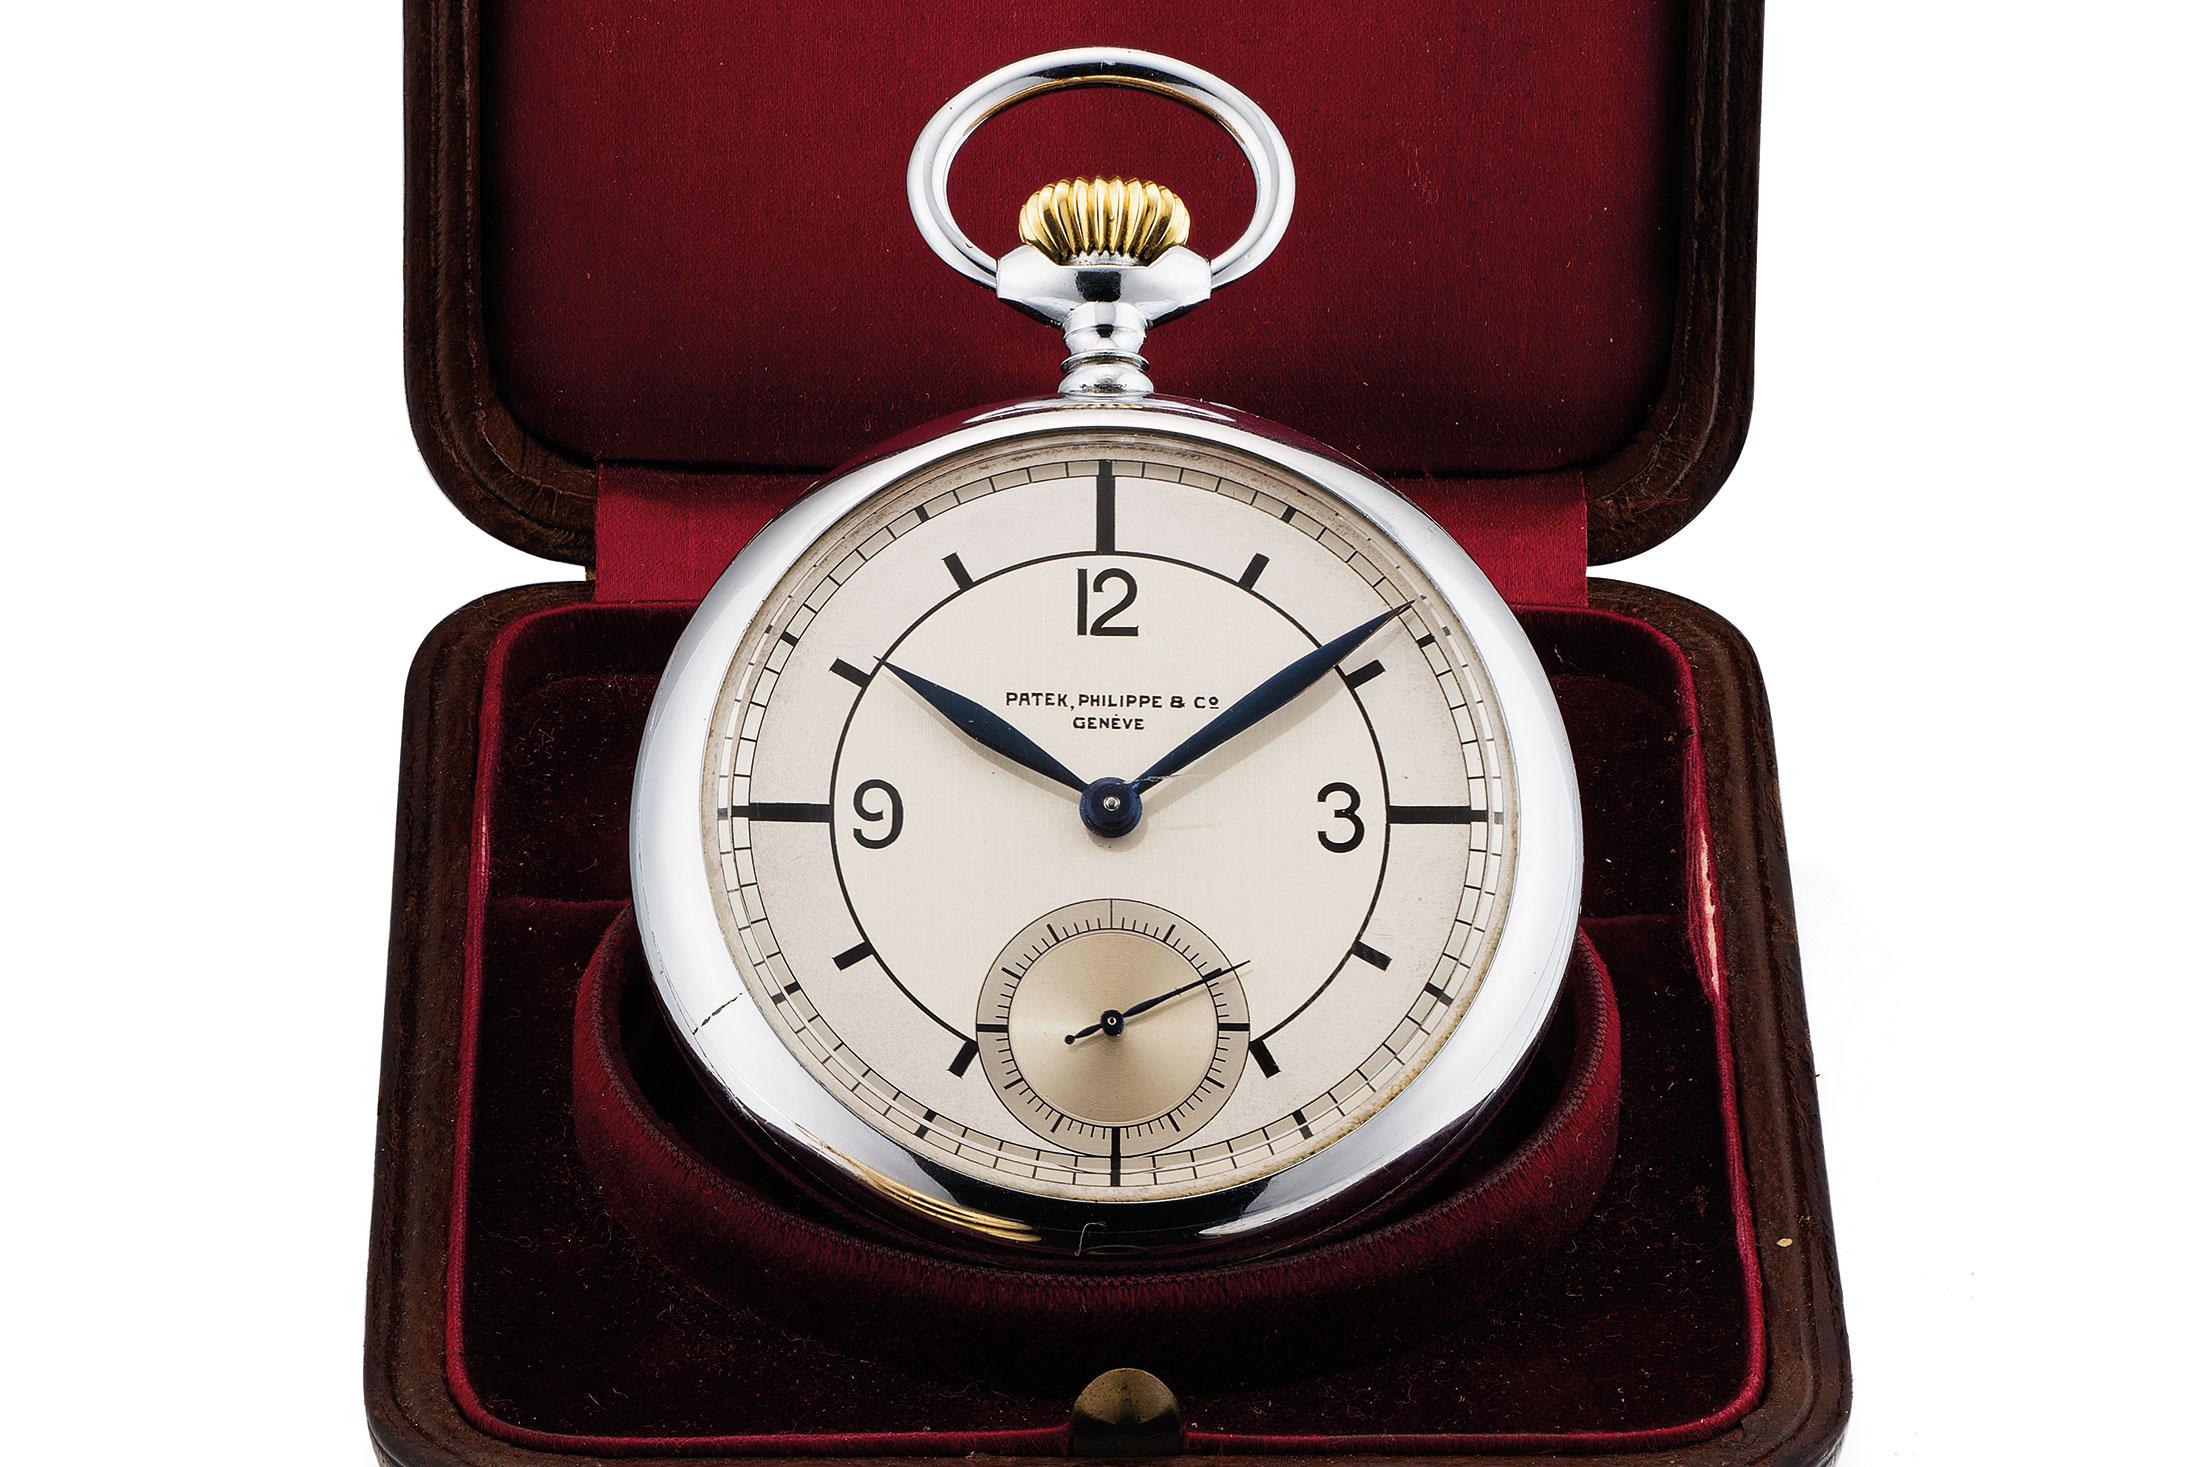 Patek Philippe Observatory Pocket Watch (Lot 315)